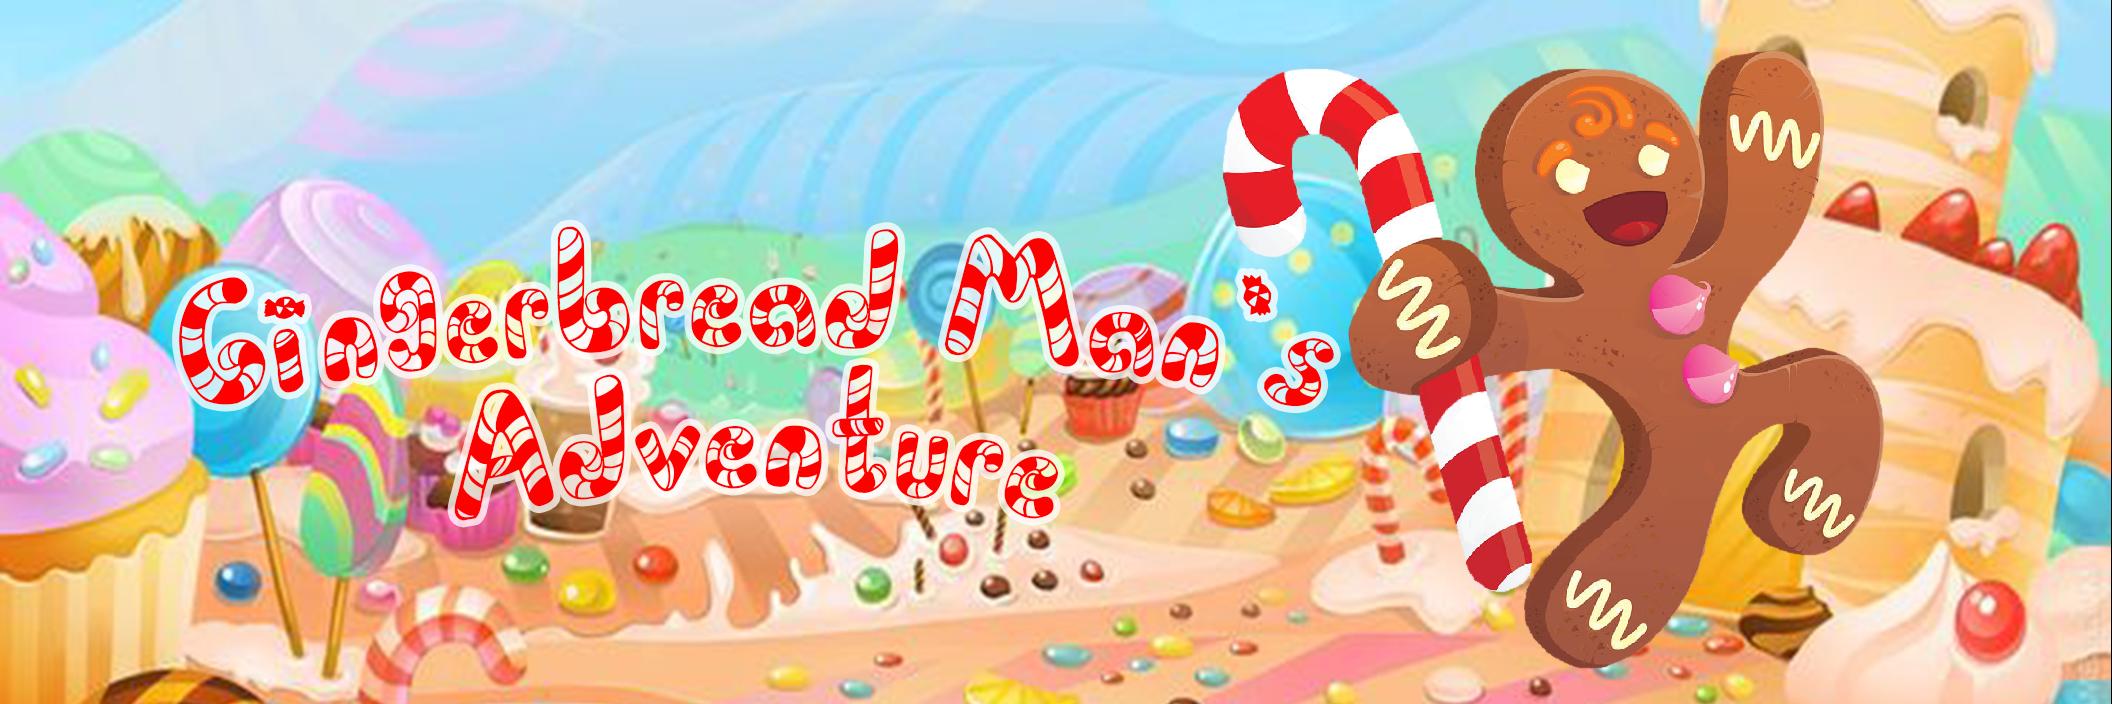 Gingerbread Man's Adventure